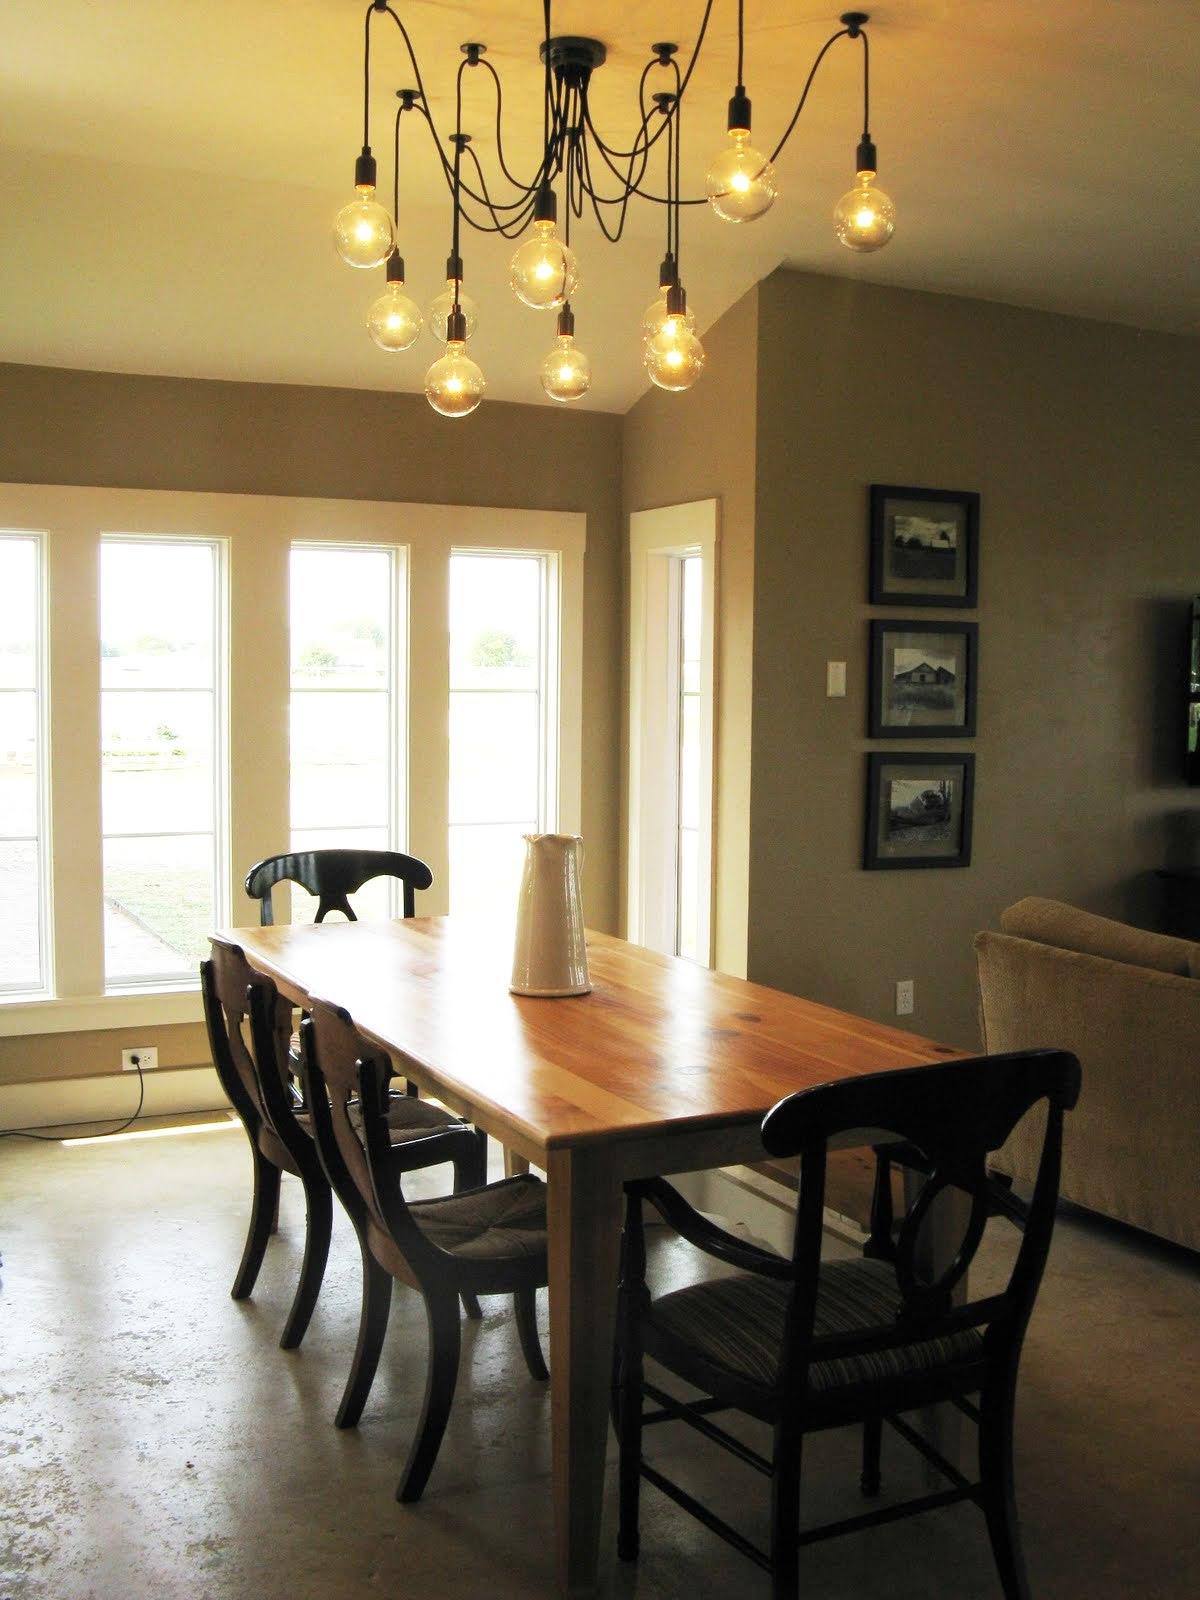 TOP 10 Dining room ceiling lights of 2019 | Warisan Lighting